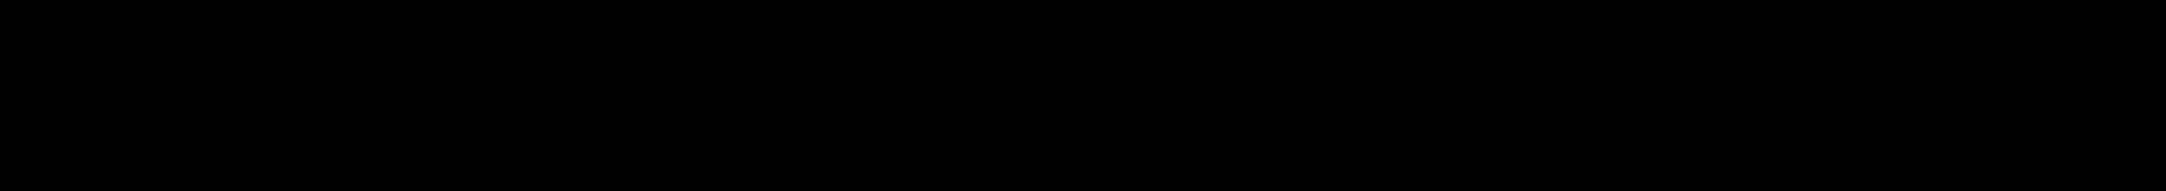 LA Headlights BTN Italic